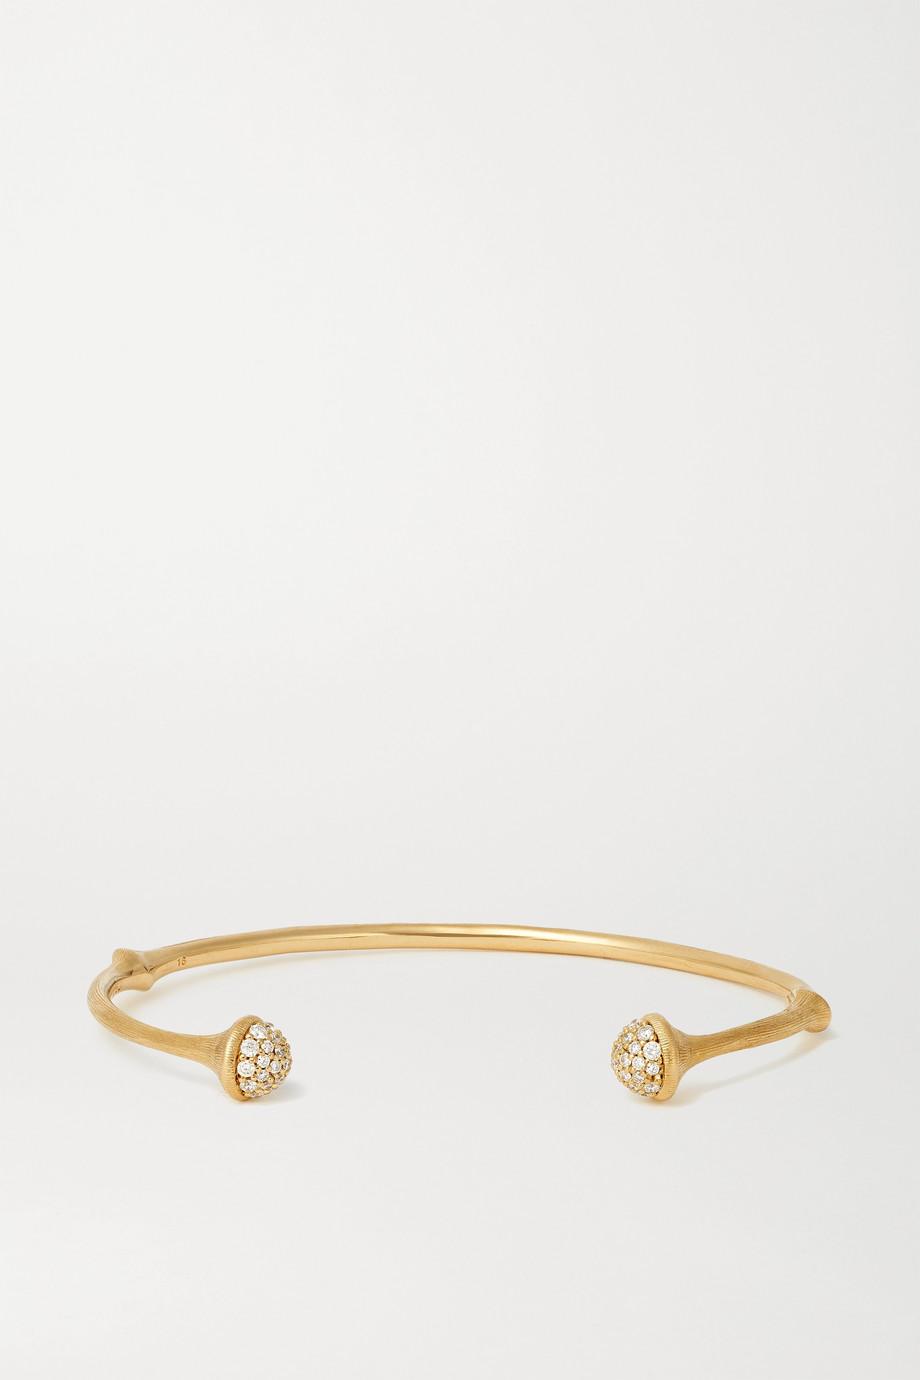 OLE LYNGGAARD COPENHAGEN Nature 18-karat gold diamond cuff